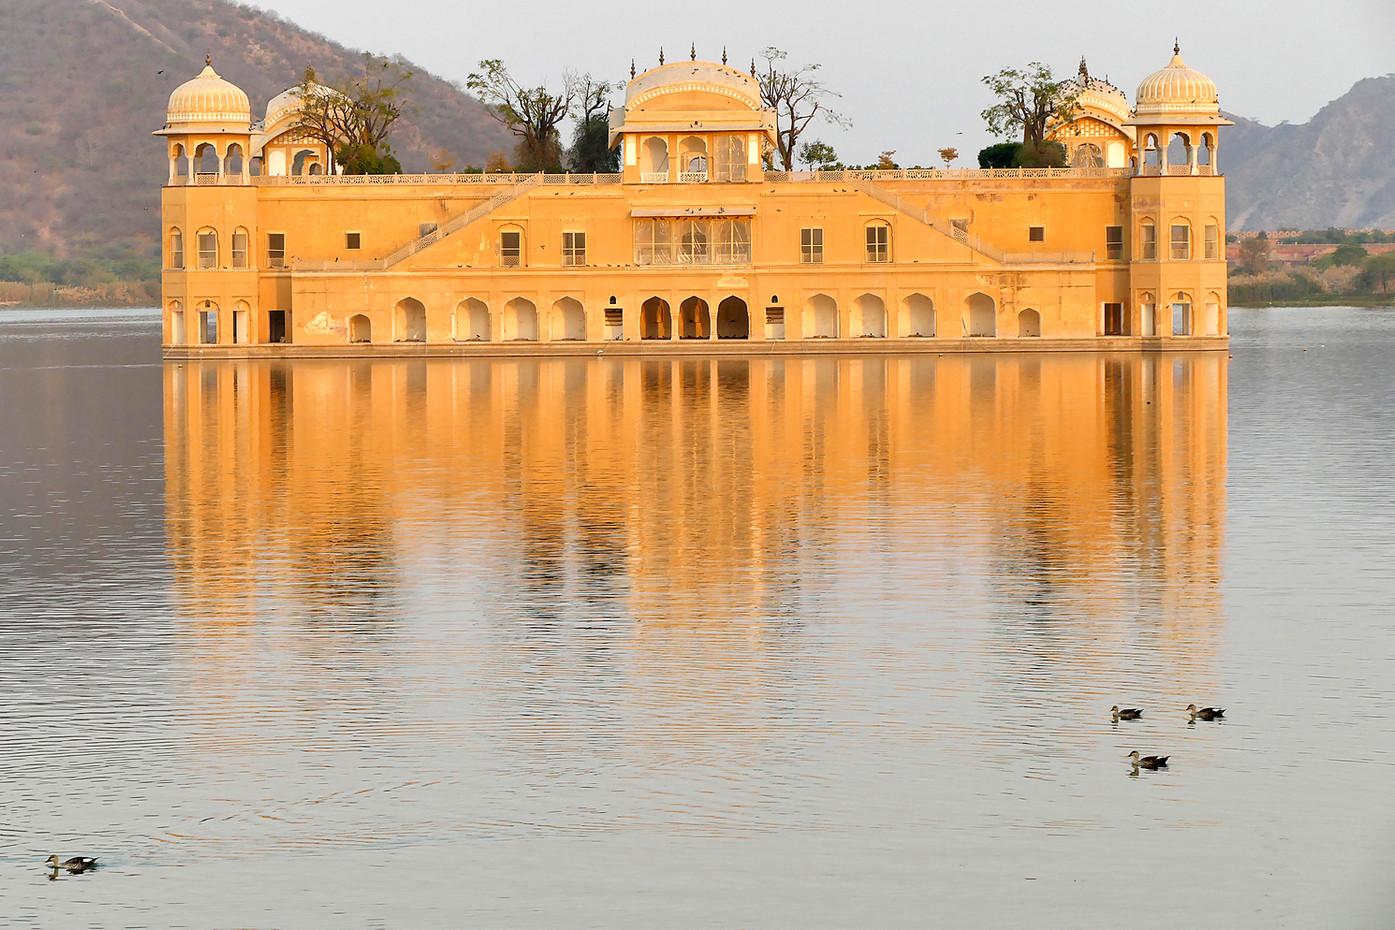 Jai Mahal Palace in Jaipur, India